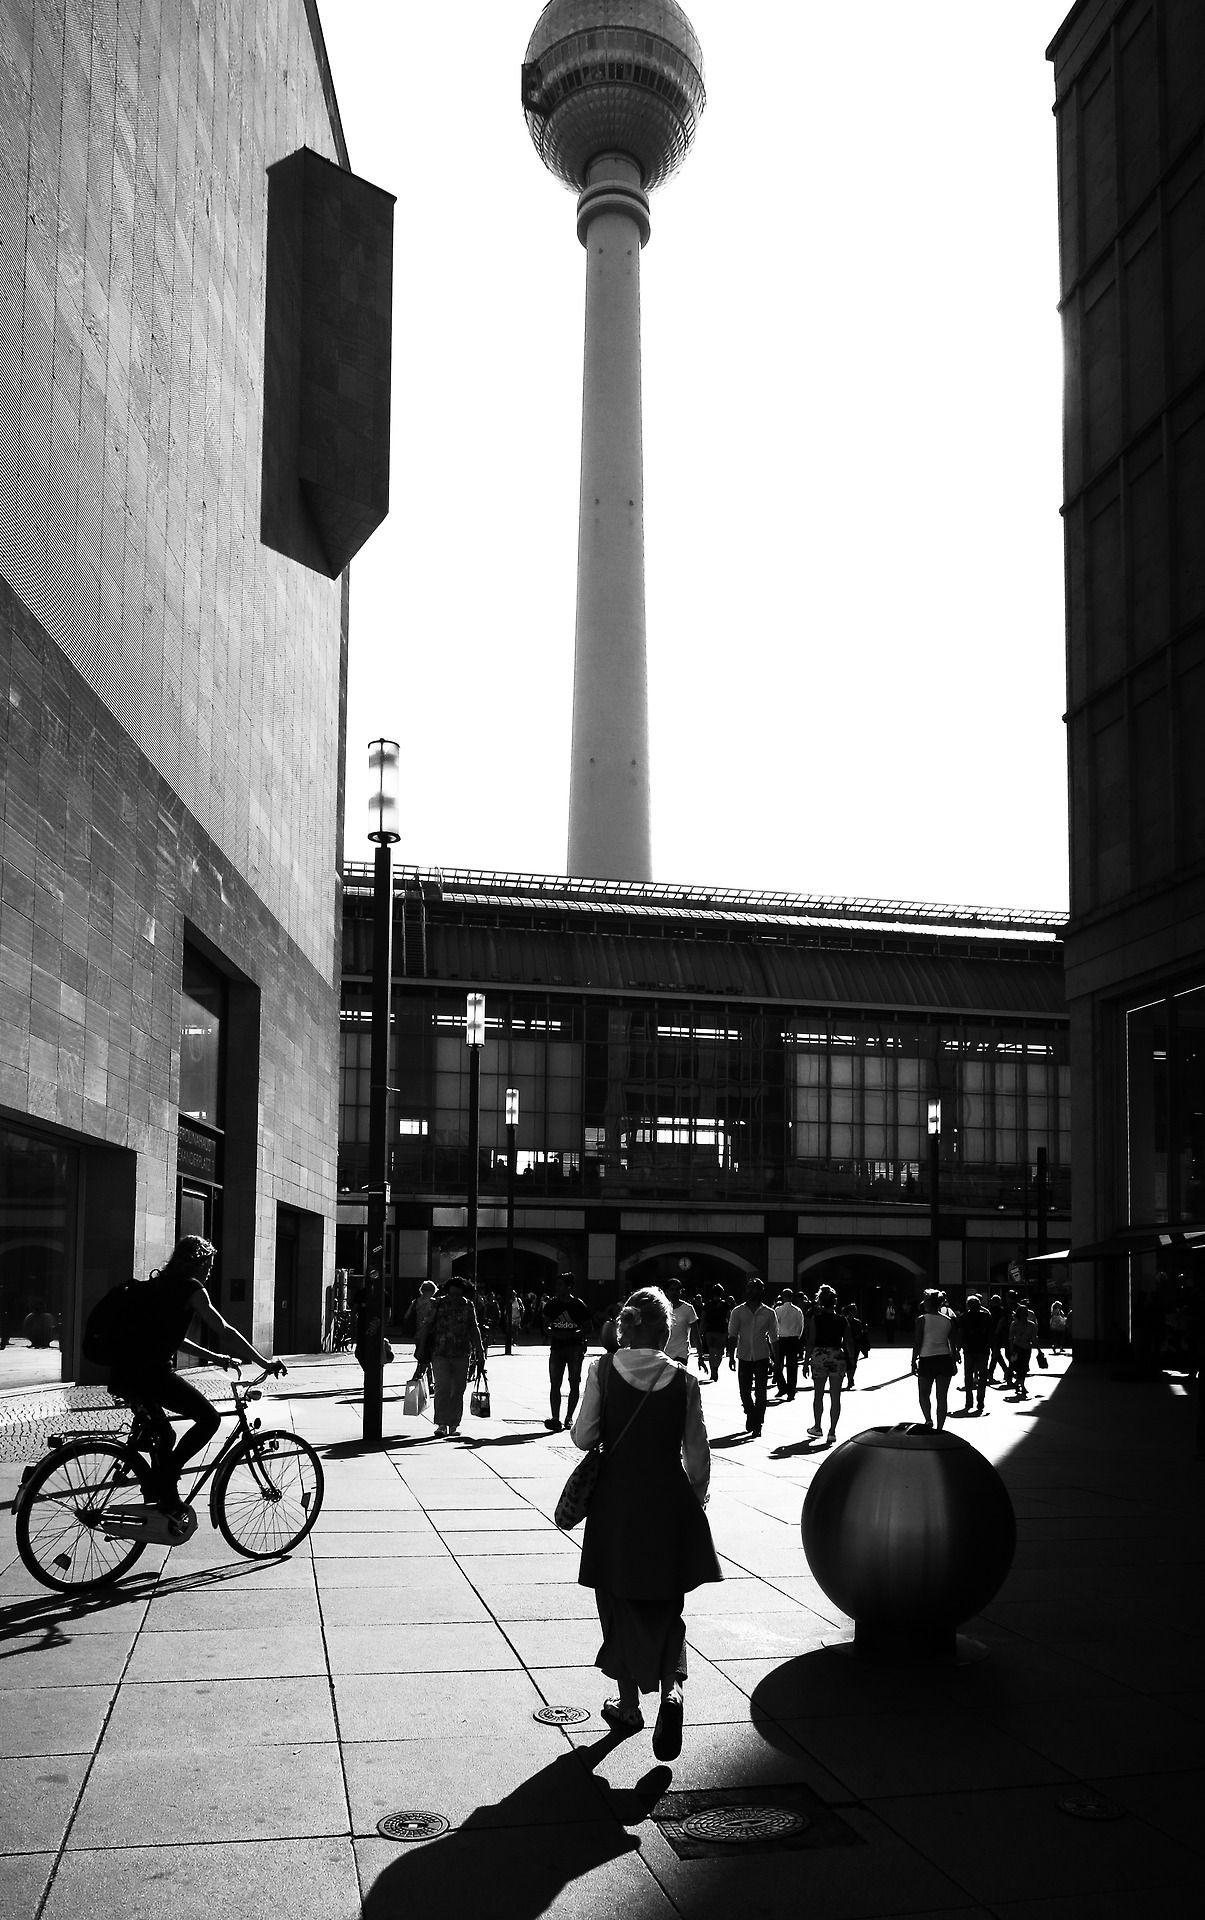 Berlin Alexanderplatz Photo Dieter Krehbiel Street Photography Urban City Photo